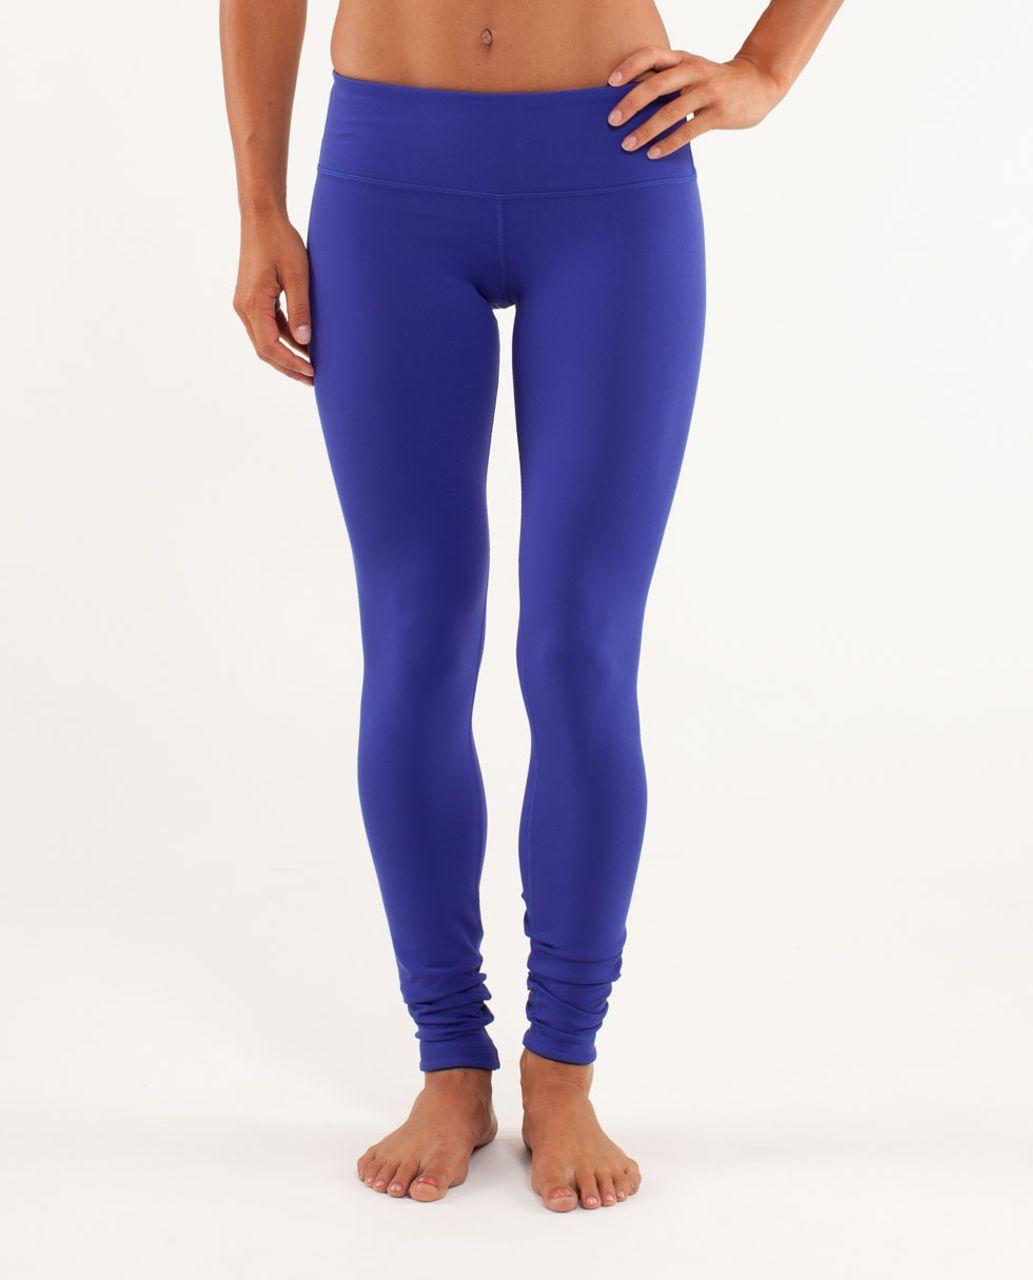 Lululemon Wunder Under Pant *Reversible - Pigment Blue /  Black